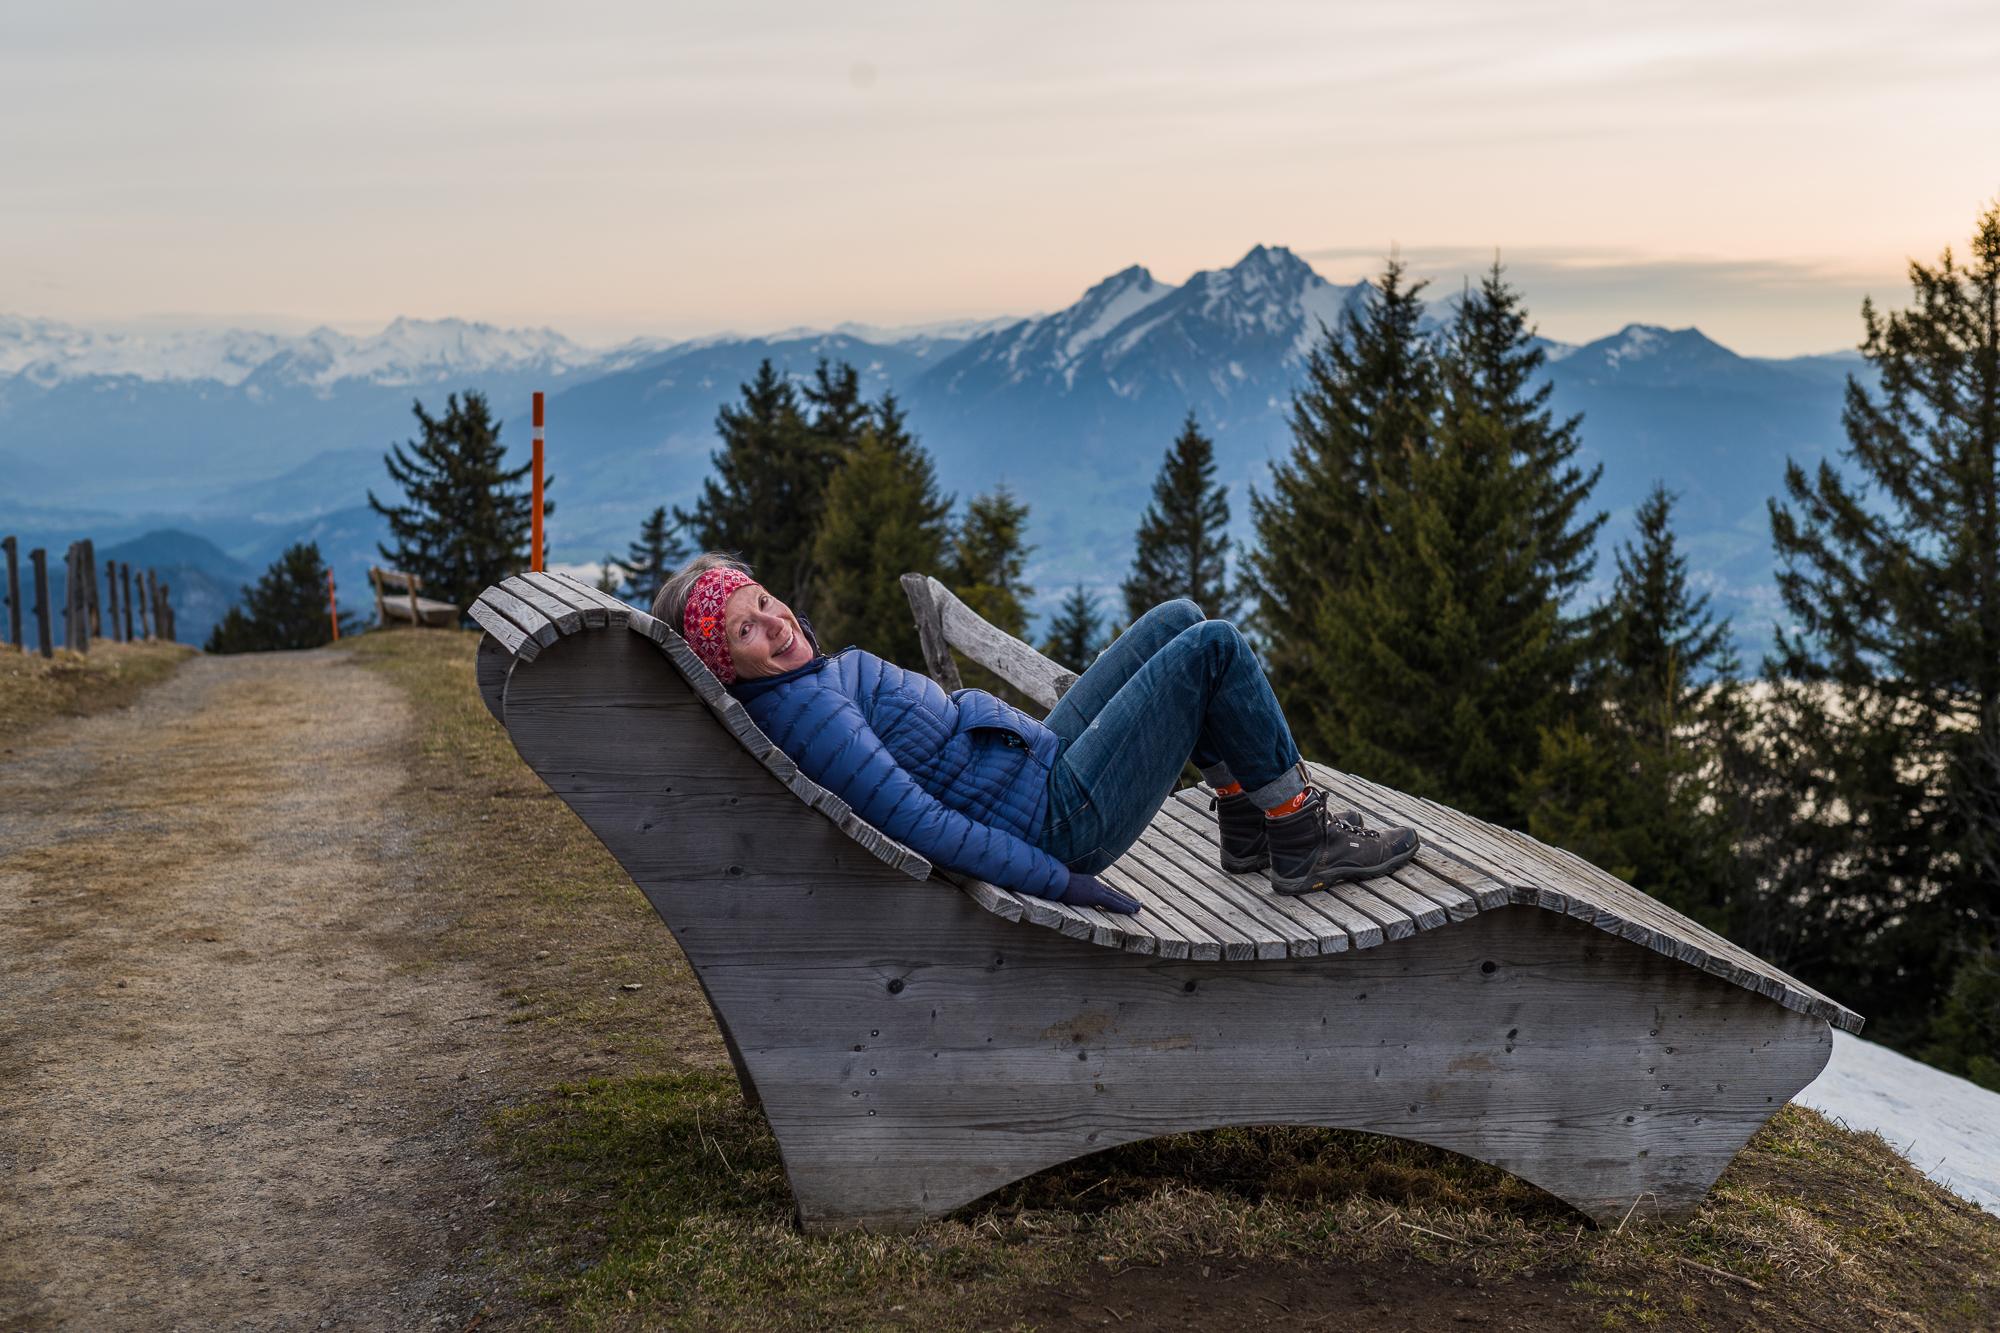 Enjoying the lounge chair on Rigi Kulm